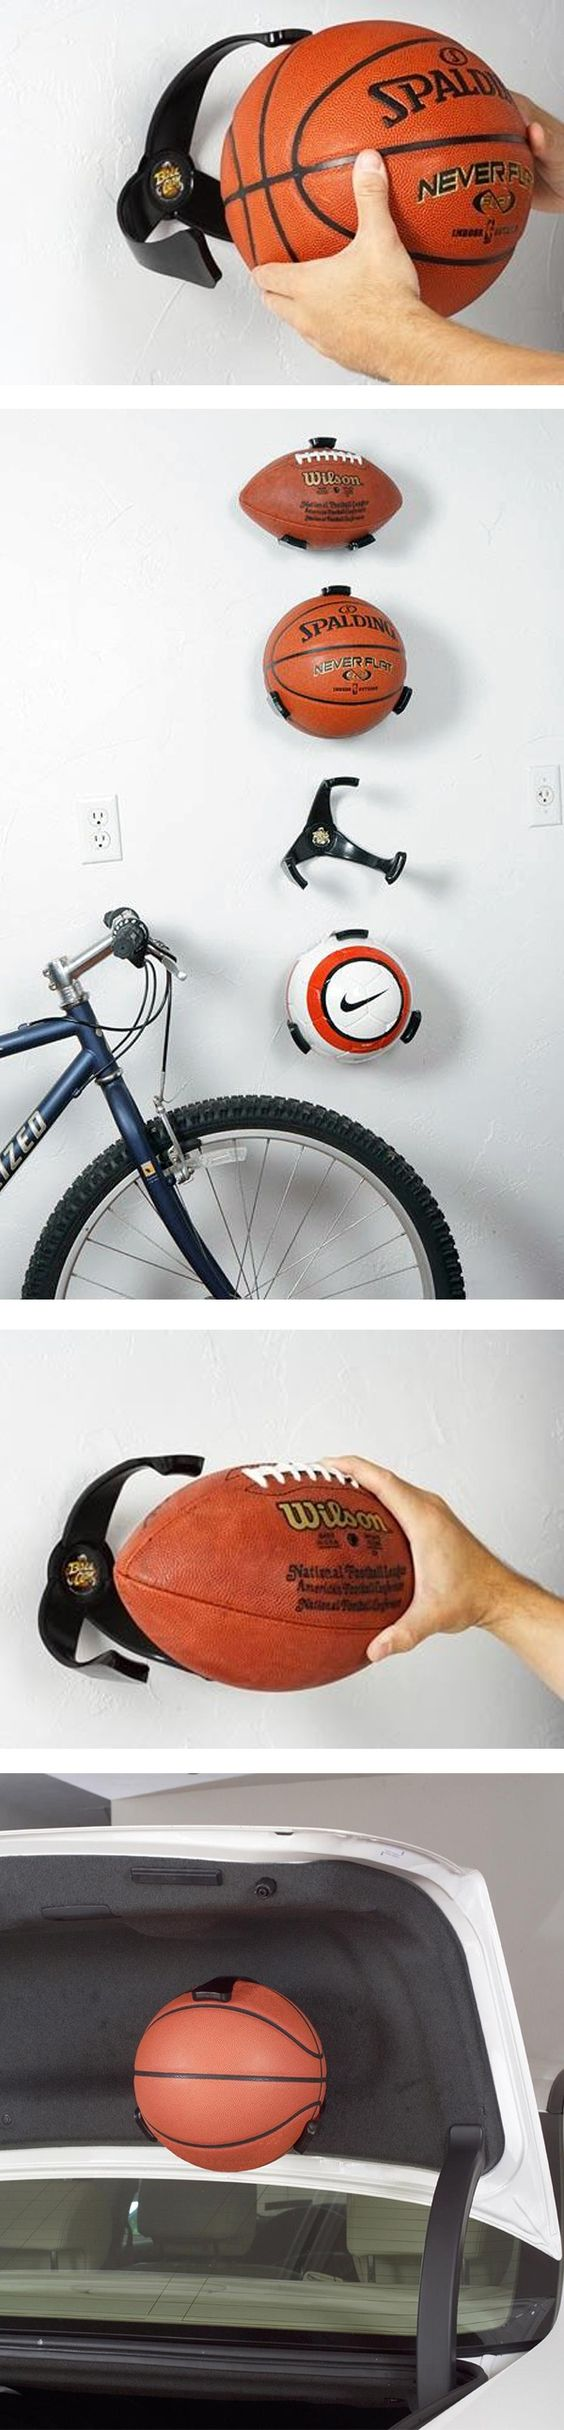 Garage Stuff For Guys : Gifts for men mariel s picks gift garage